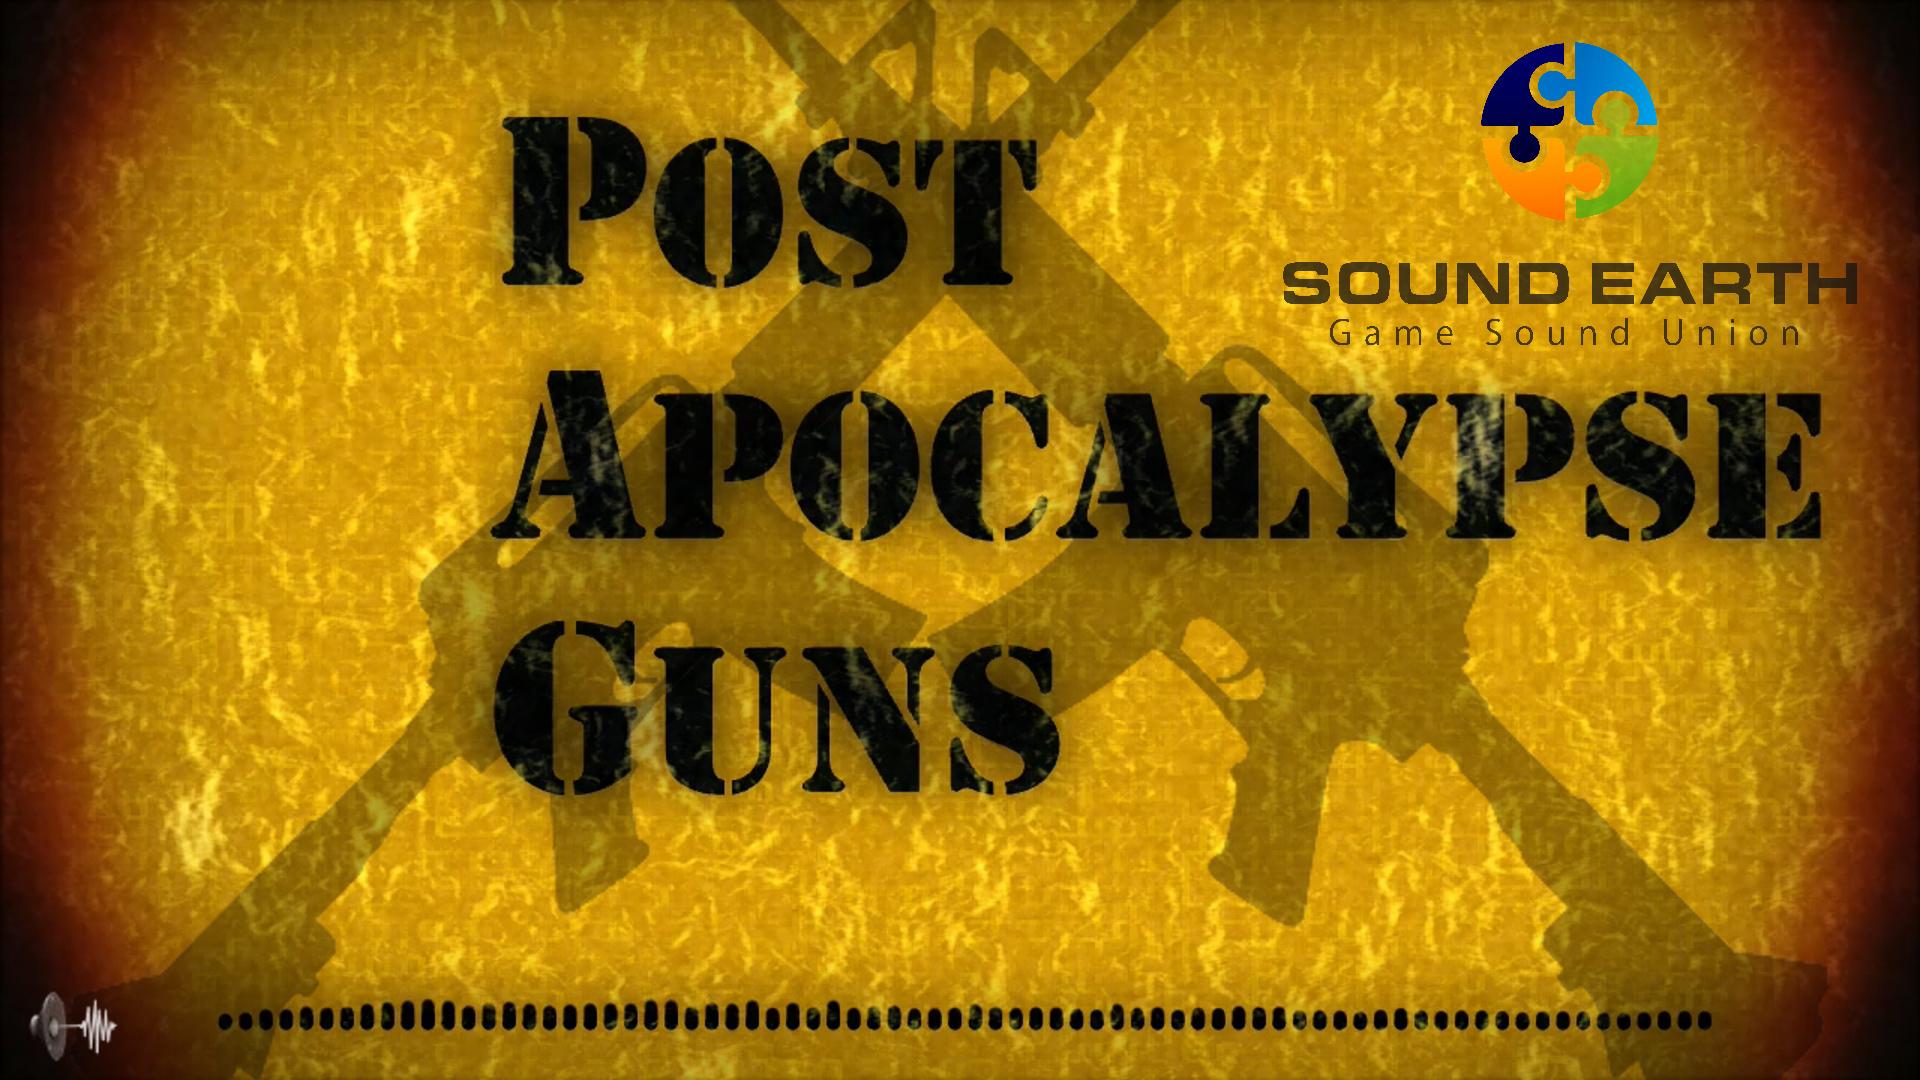 Post Apocalypse Guns (Sound Earth)